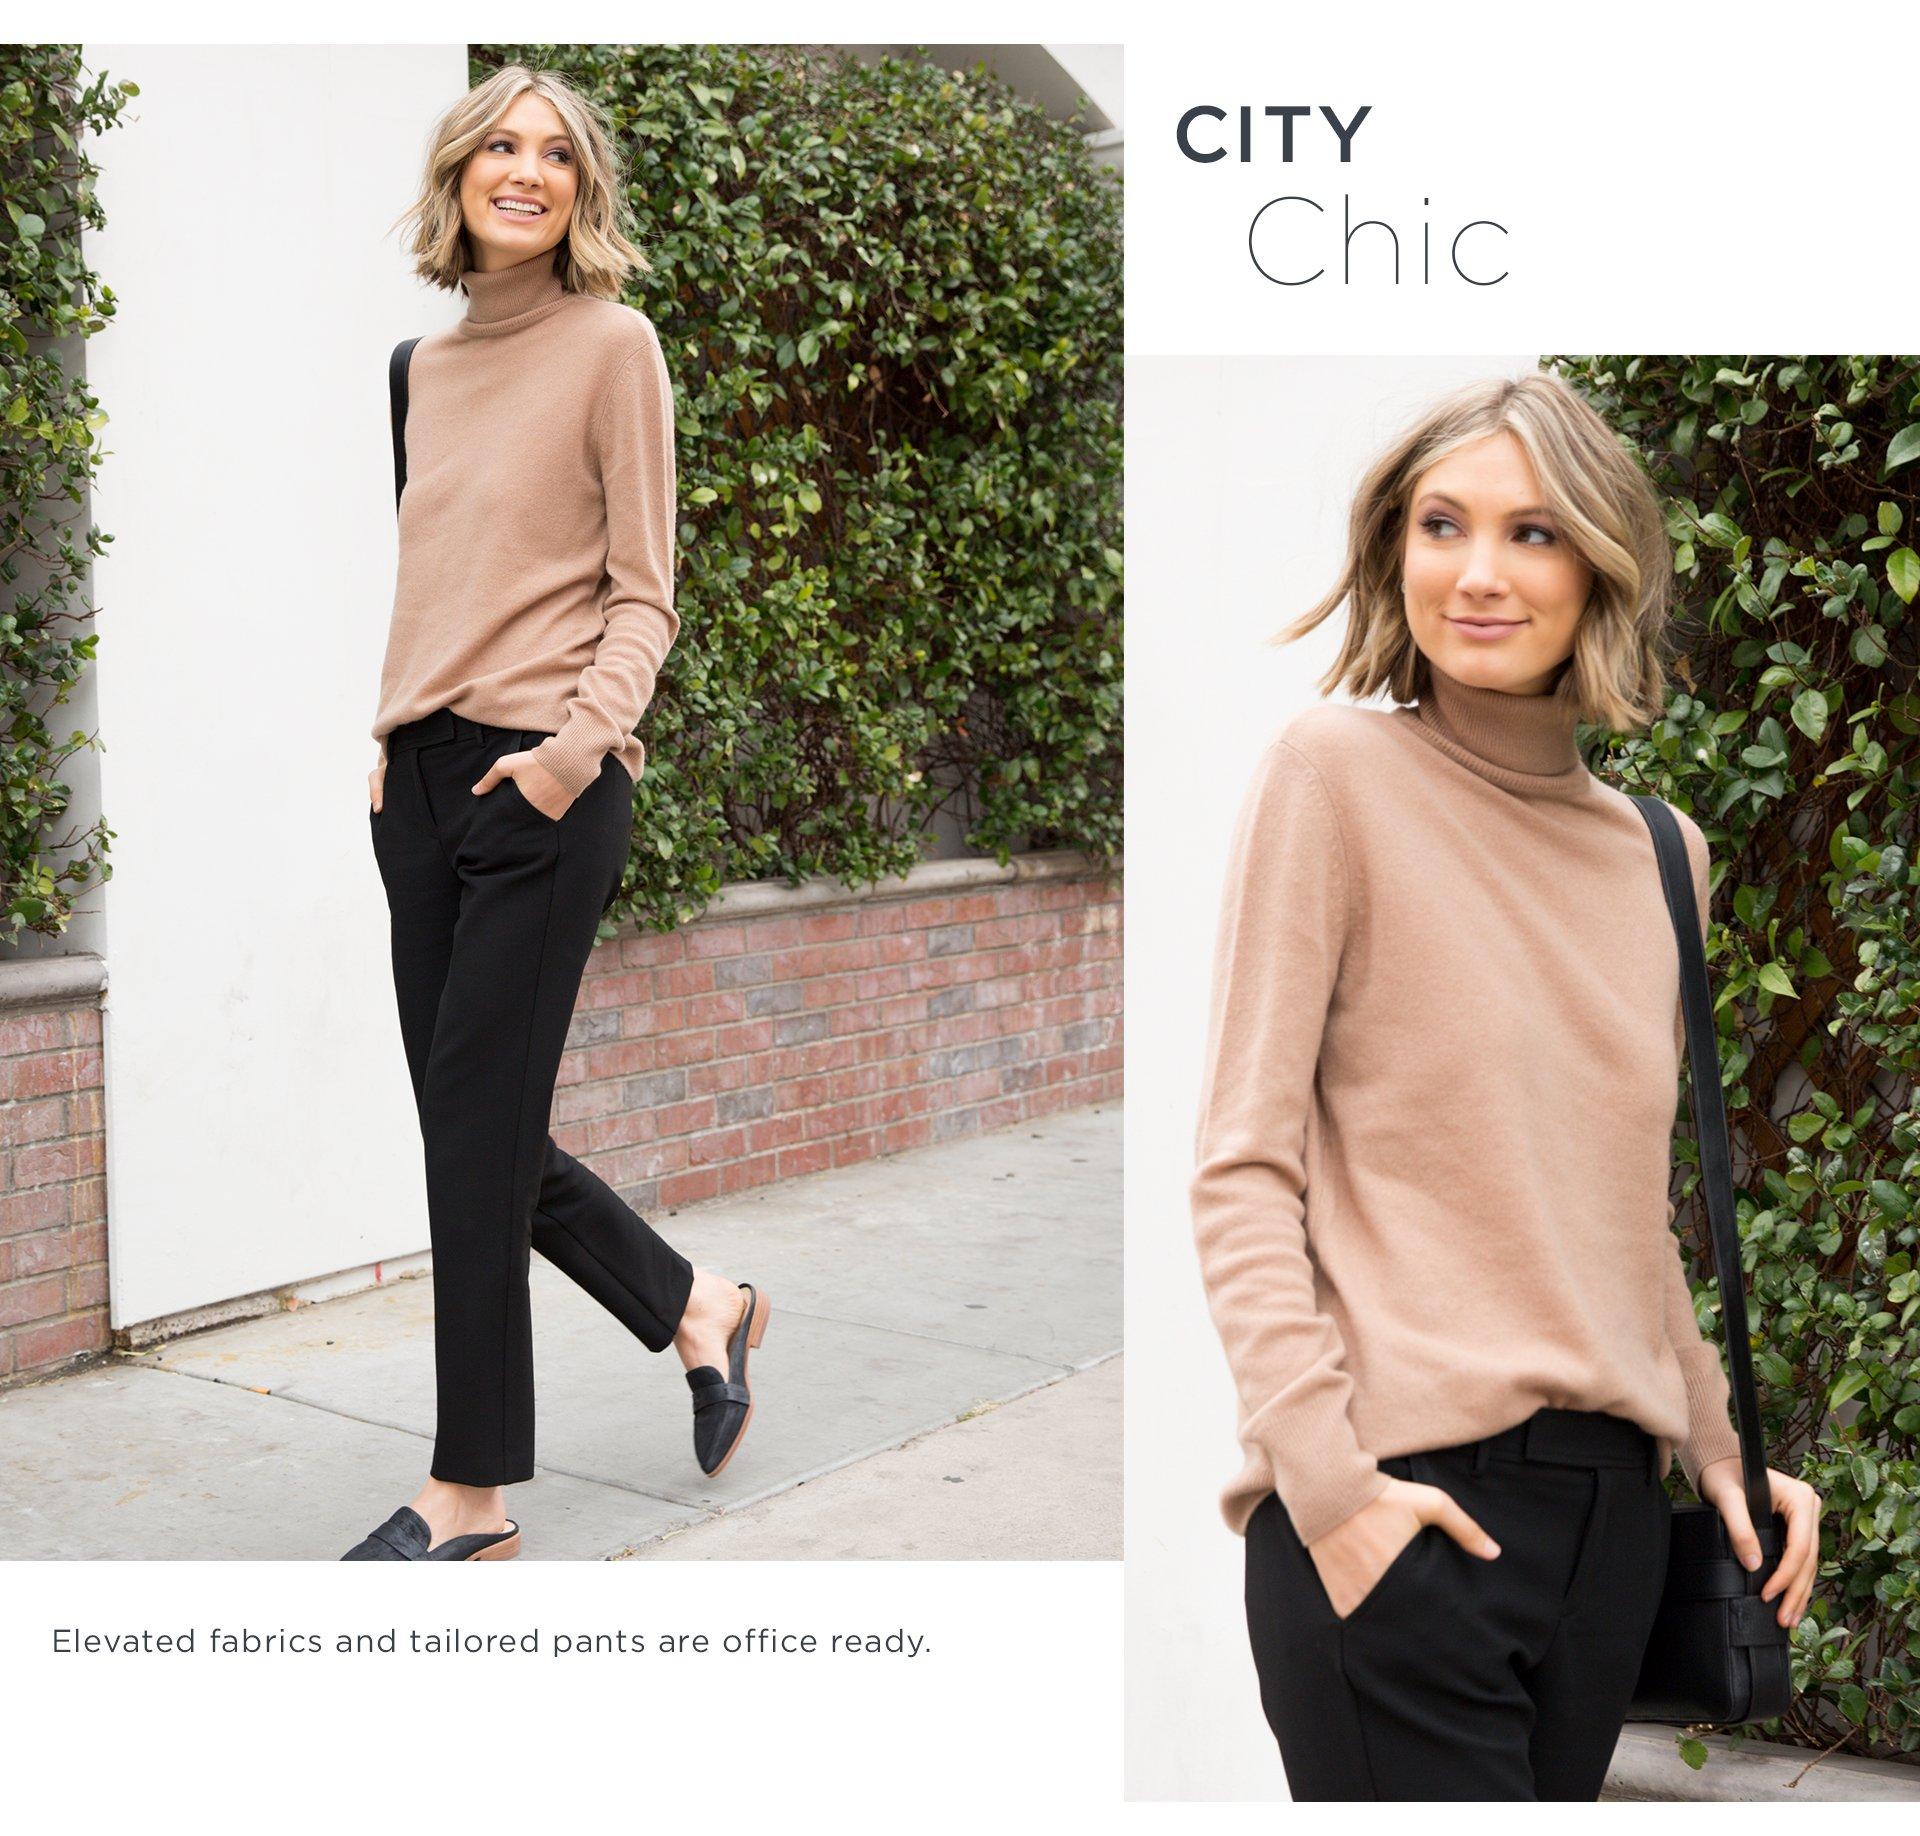 Turtleneck-City Chic